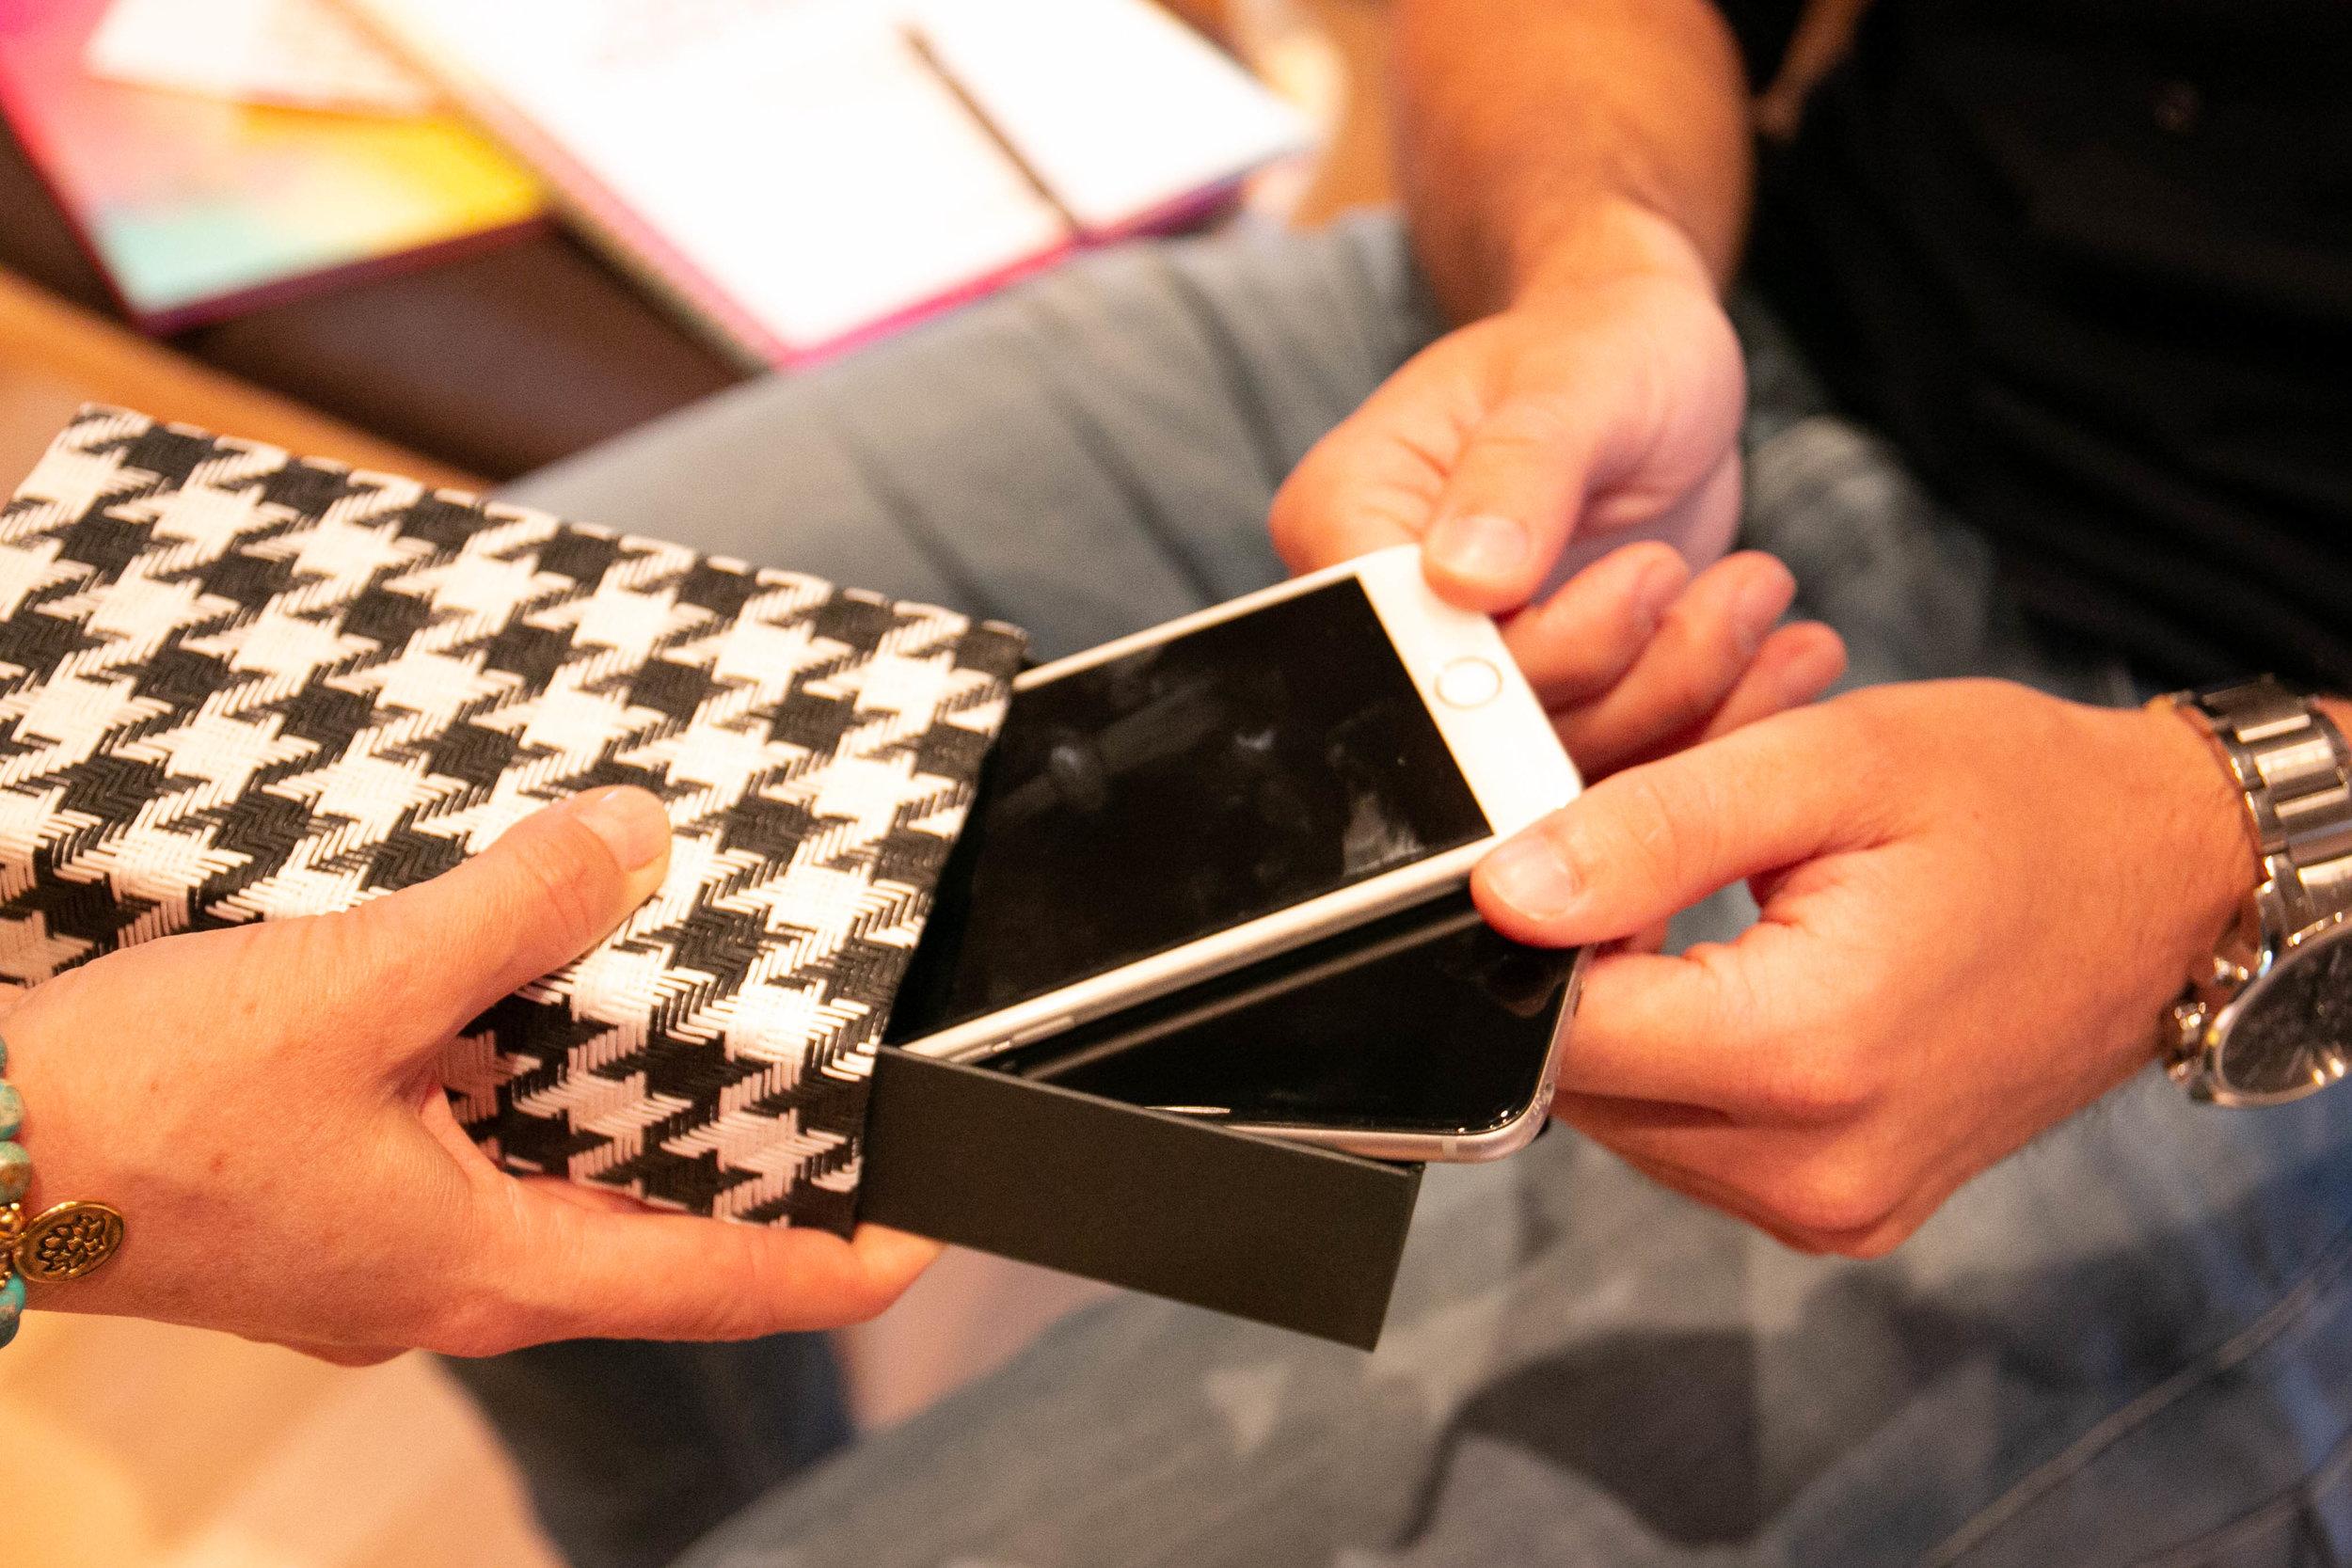 Digital_Detox_Urlaub_Schlosshotel_Fiss_Monika_Schmiderer_SWITCHOFF_SmartphoneboxIMG_9725.jpg